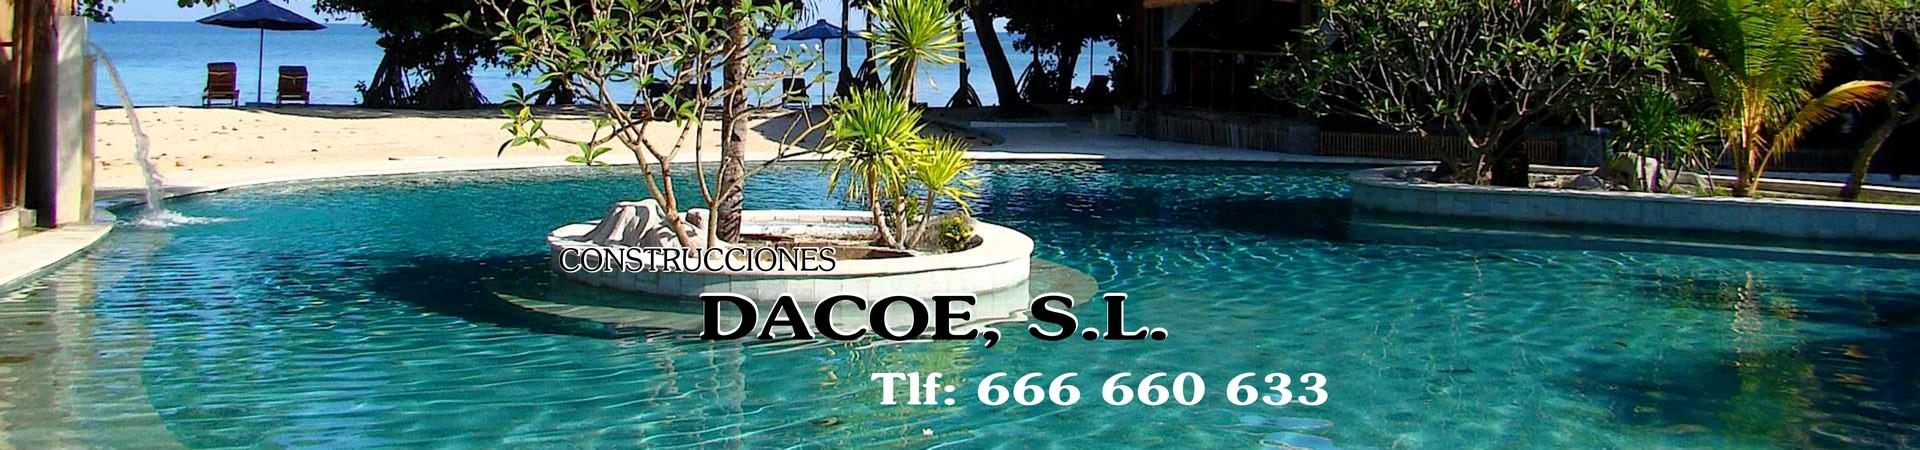 piscinas,  productos piscinas , piscinas en toda españa , construccion de piscinas a medida